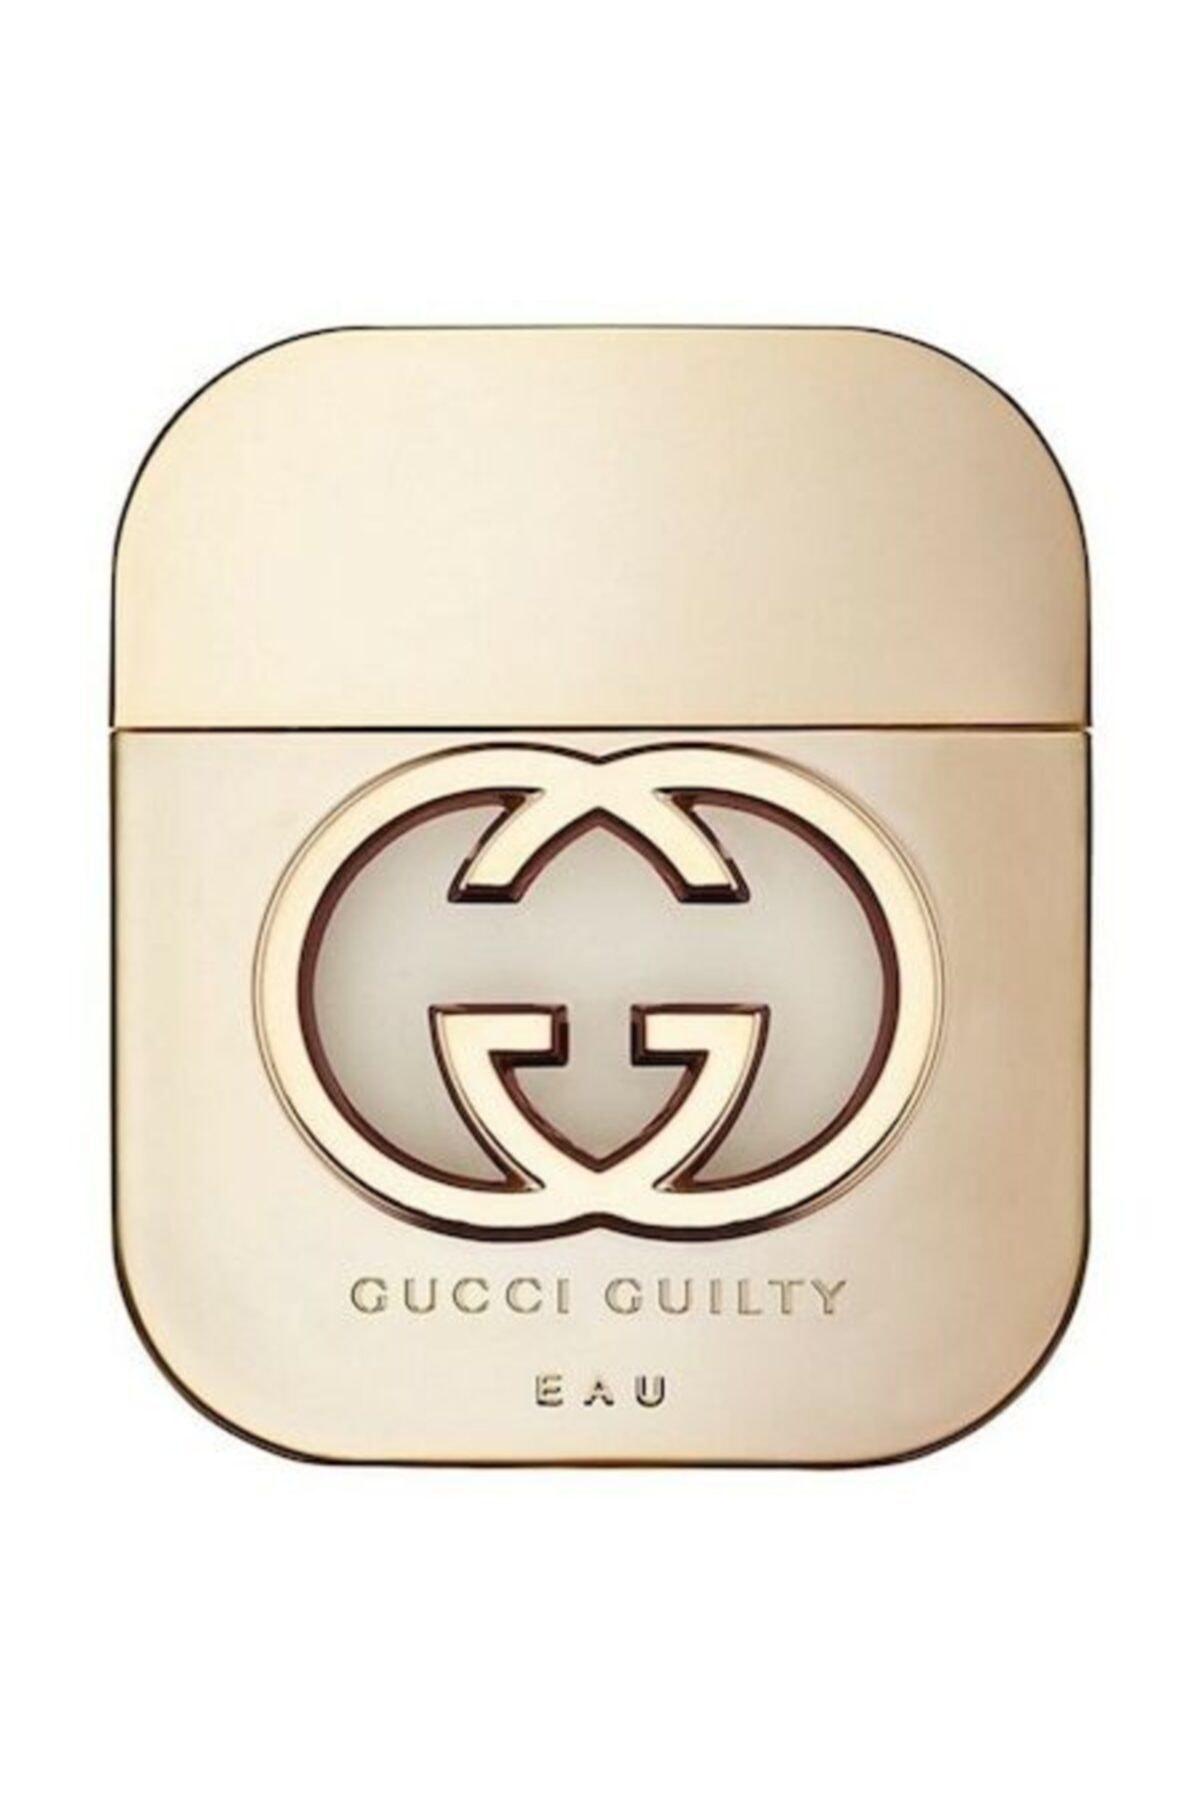 Gucci Guilty Eau Edt 50 Ml Kadın Parfümü 730870174586 1